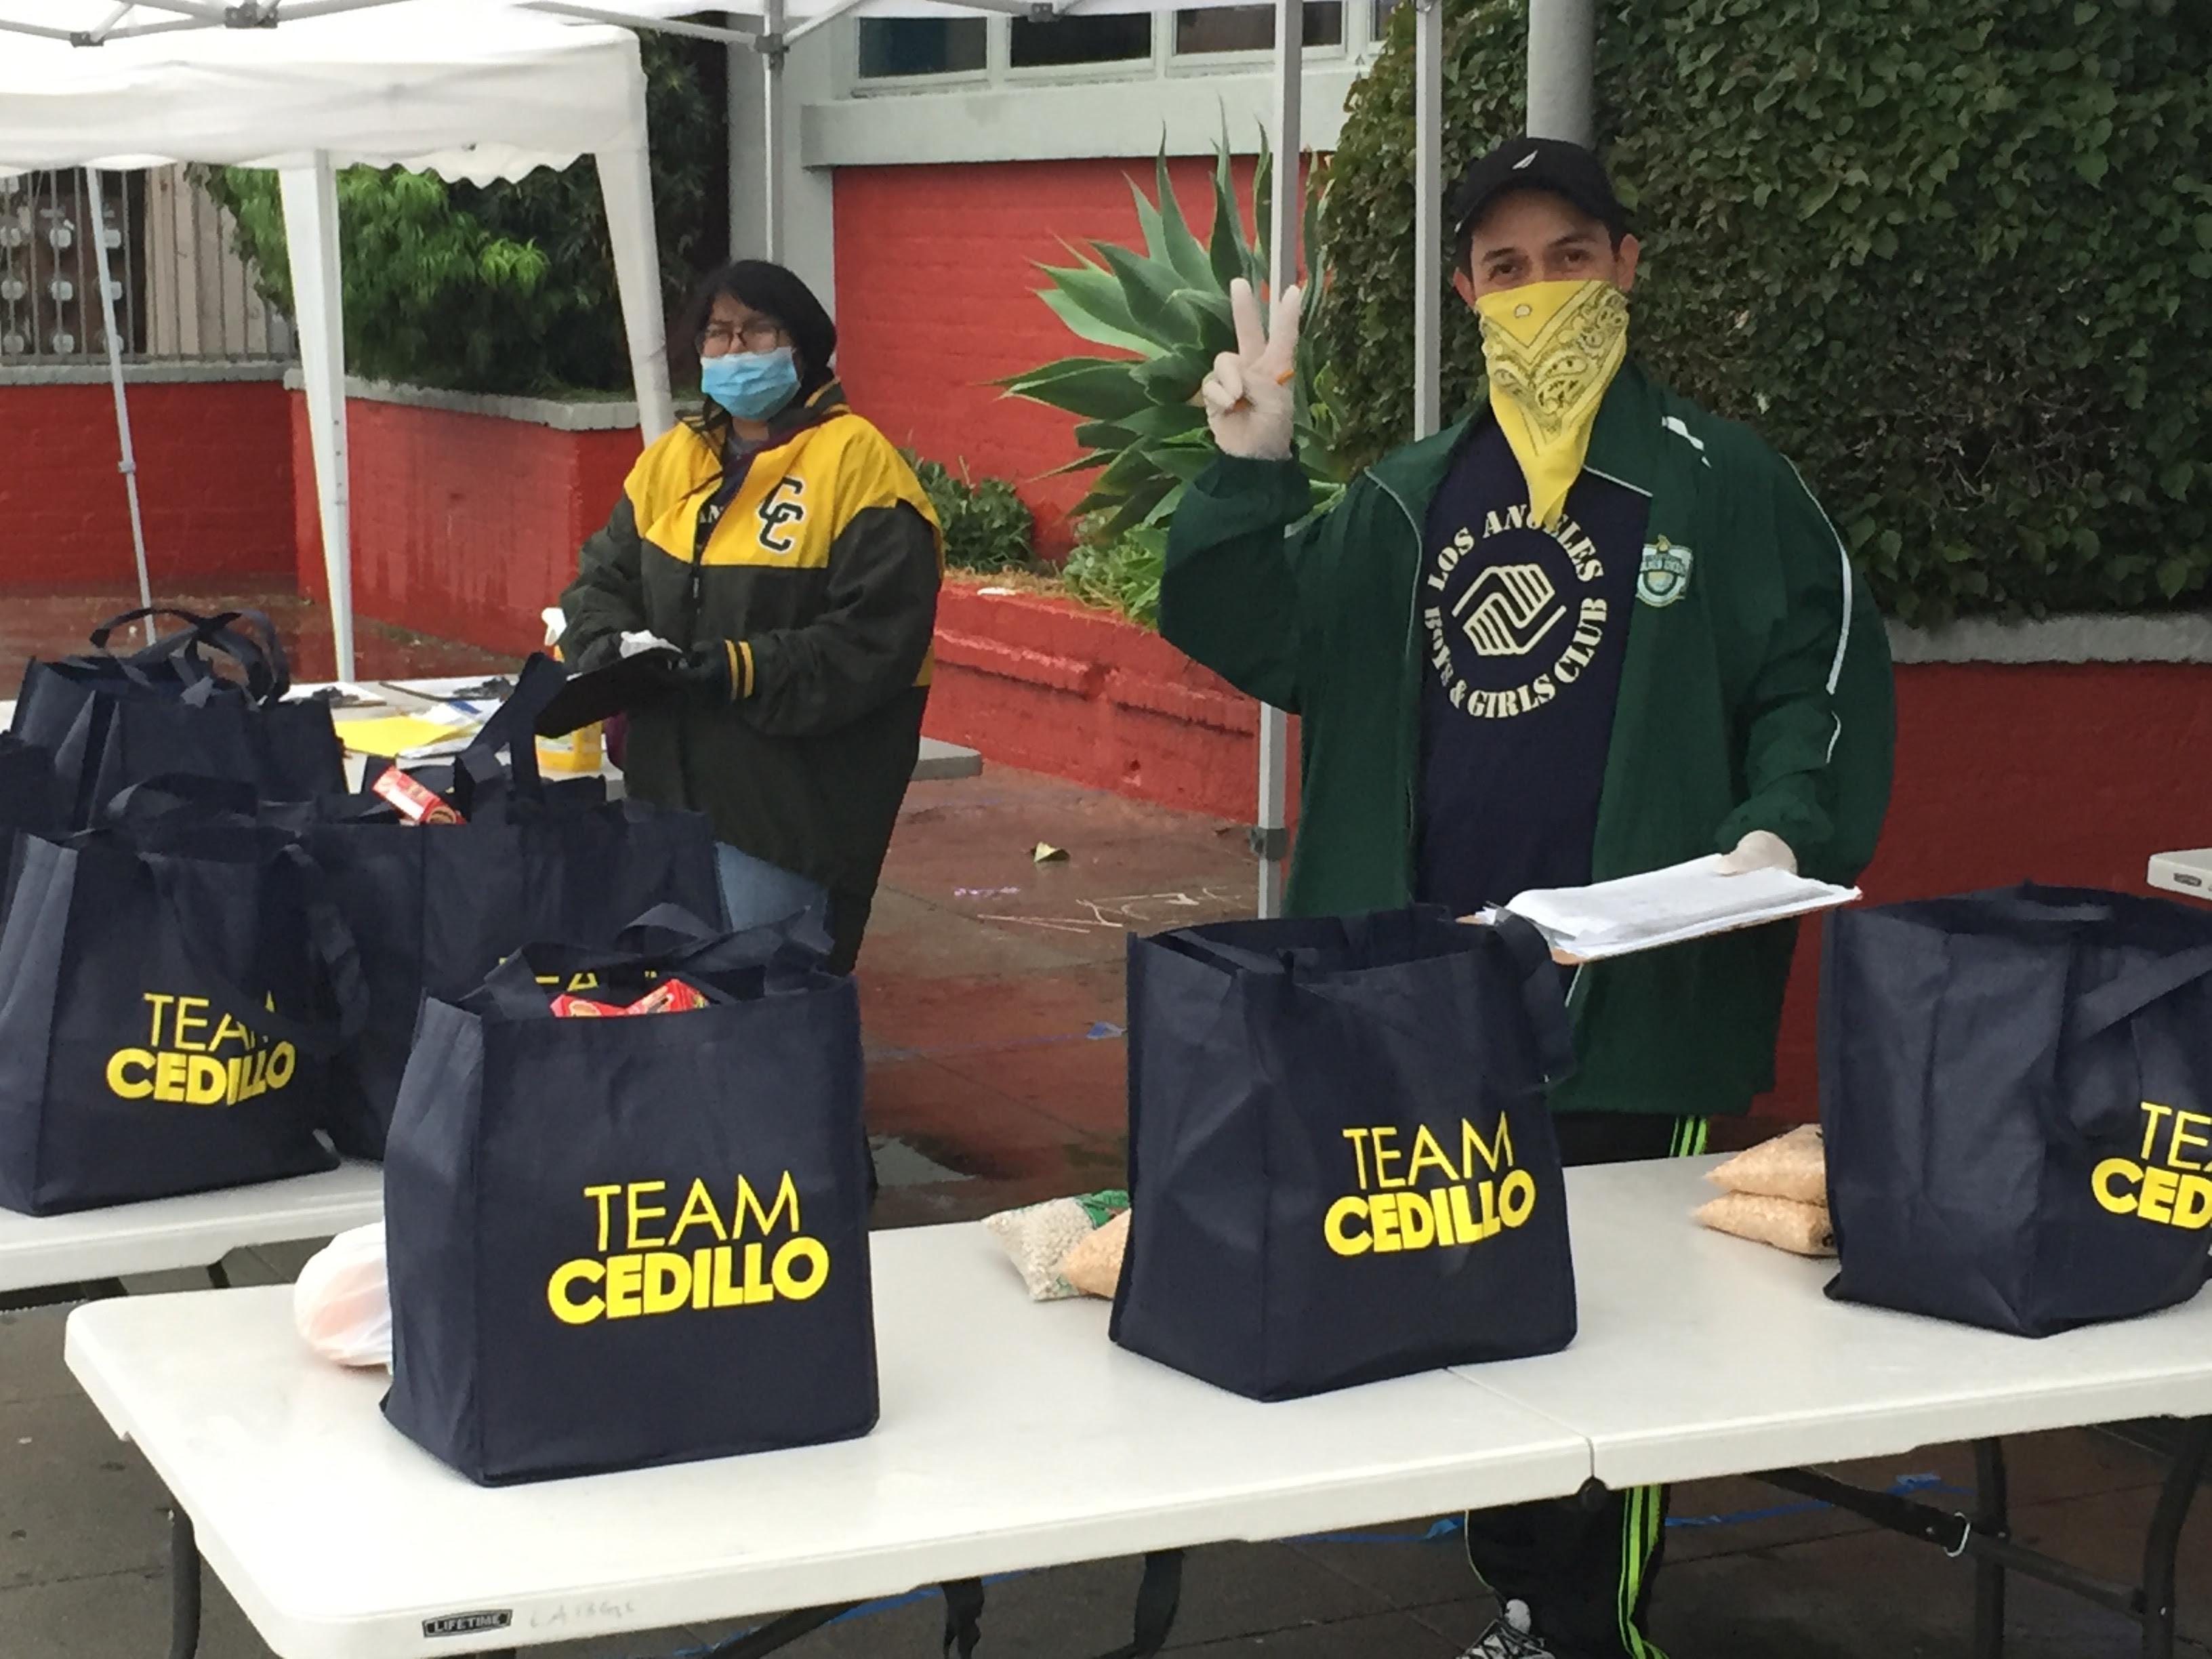 LA Boys and Girls Club Food Bank 4-9-2020  #2